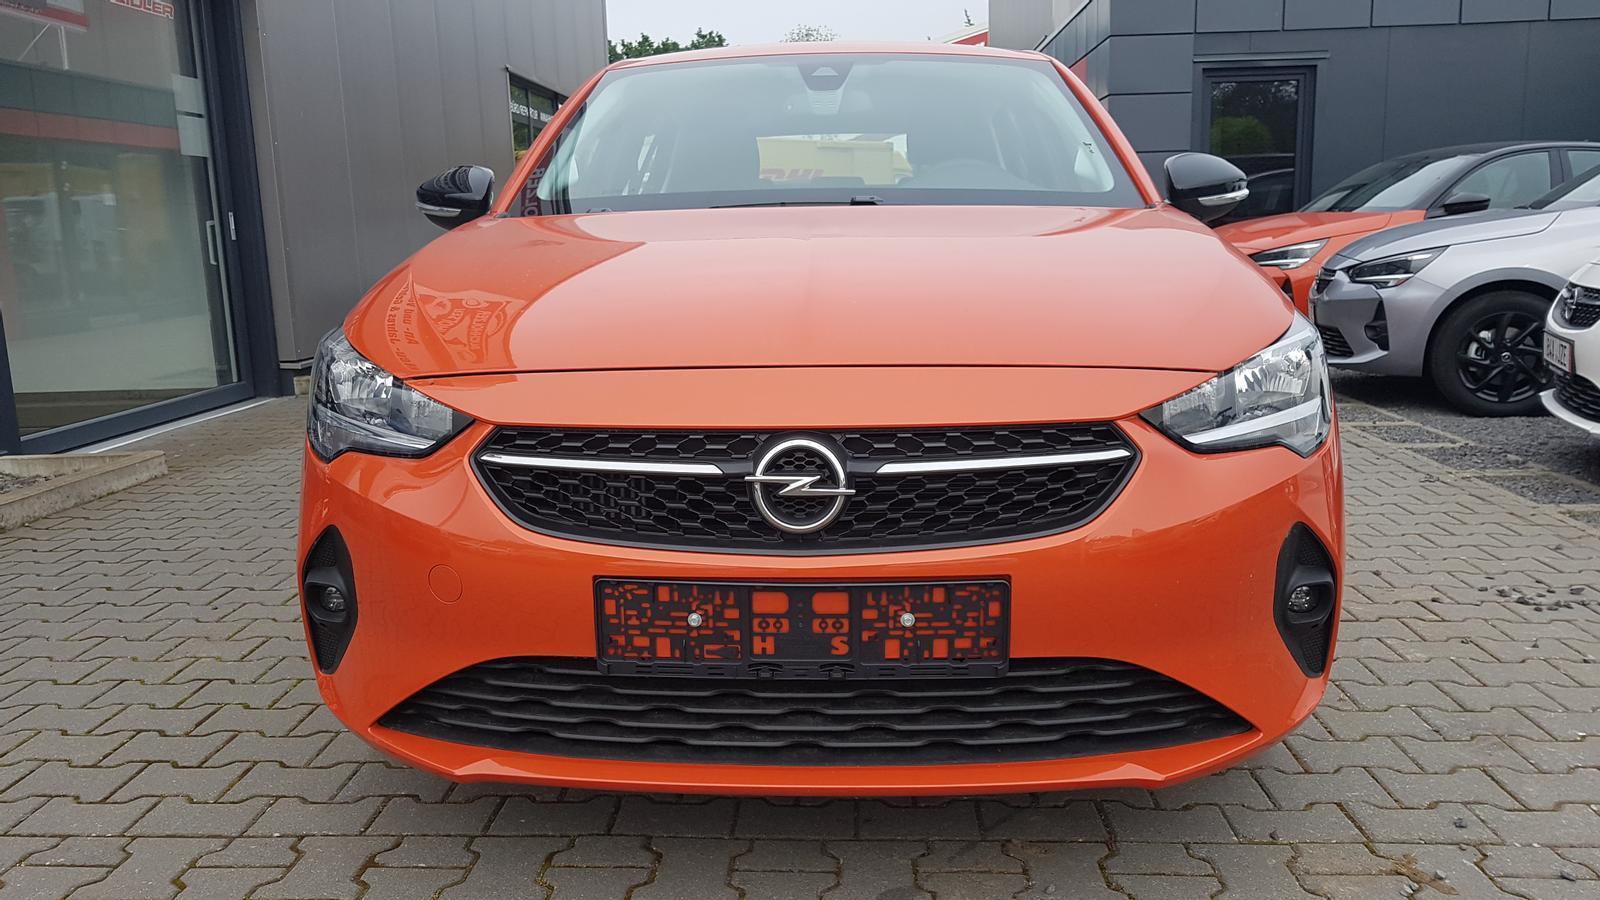 Opel Corsa F Edition*Shzg*Klima*16Zoll*PDC*App